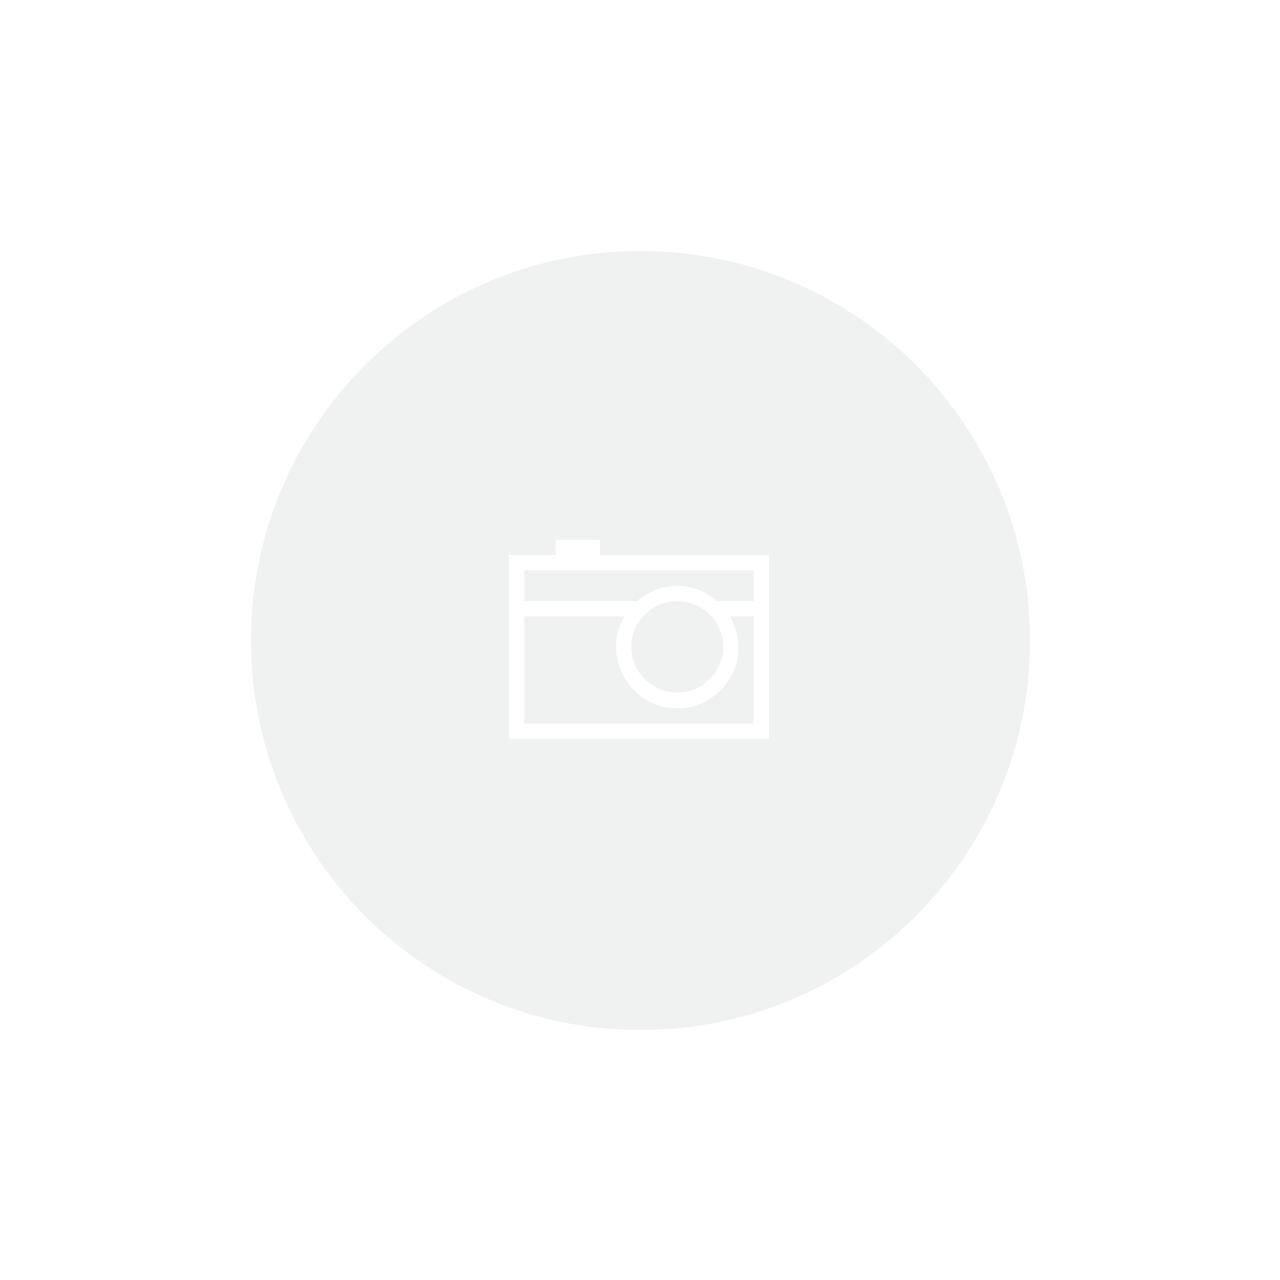 BICICLETA SPEED BMC TM SLR02 TWO 2019 CARB 22V 105